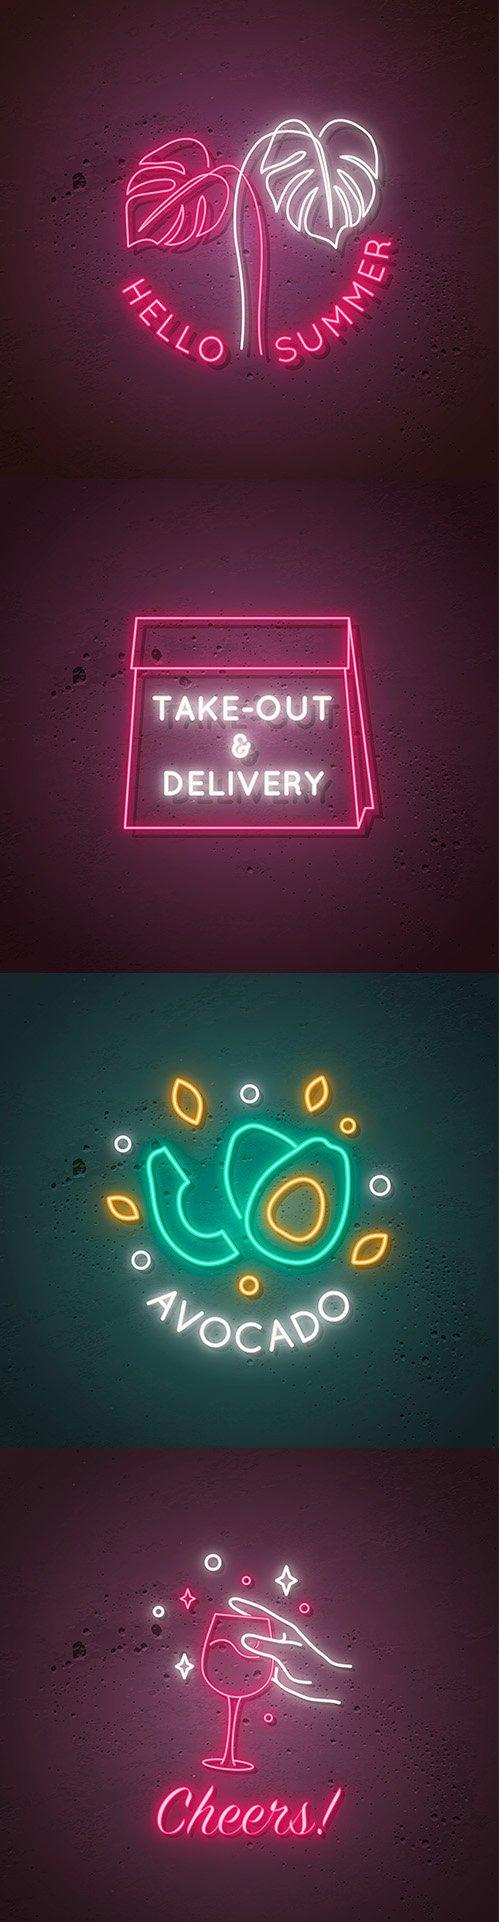 Neon Signboard Illustrations